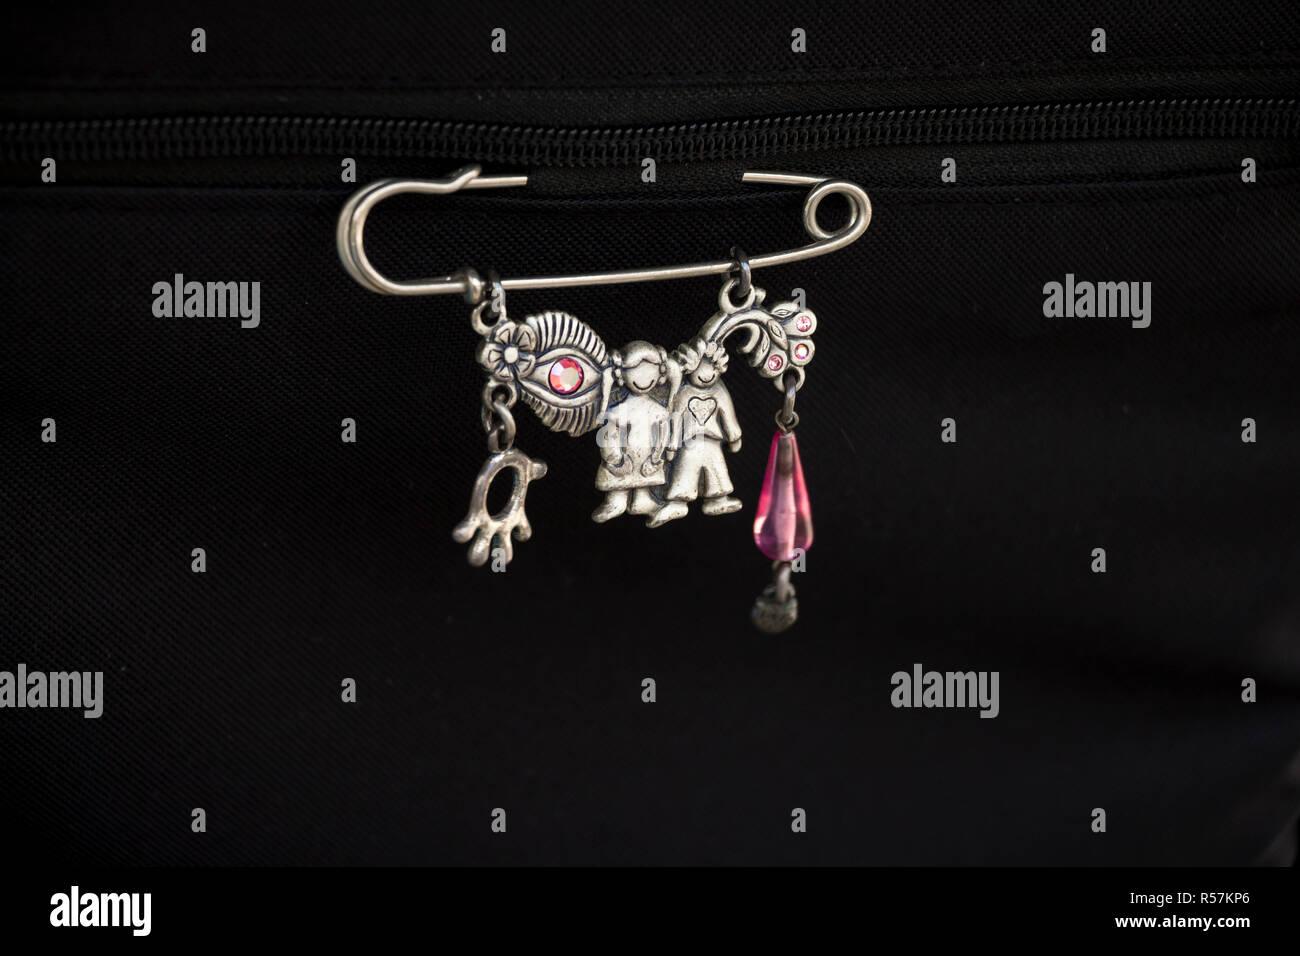 Baby Boy Jewellery Stock Photos Amp Baby Boy Jewellery Stock